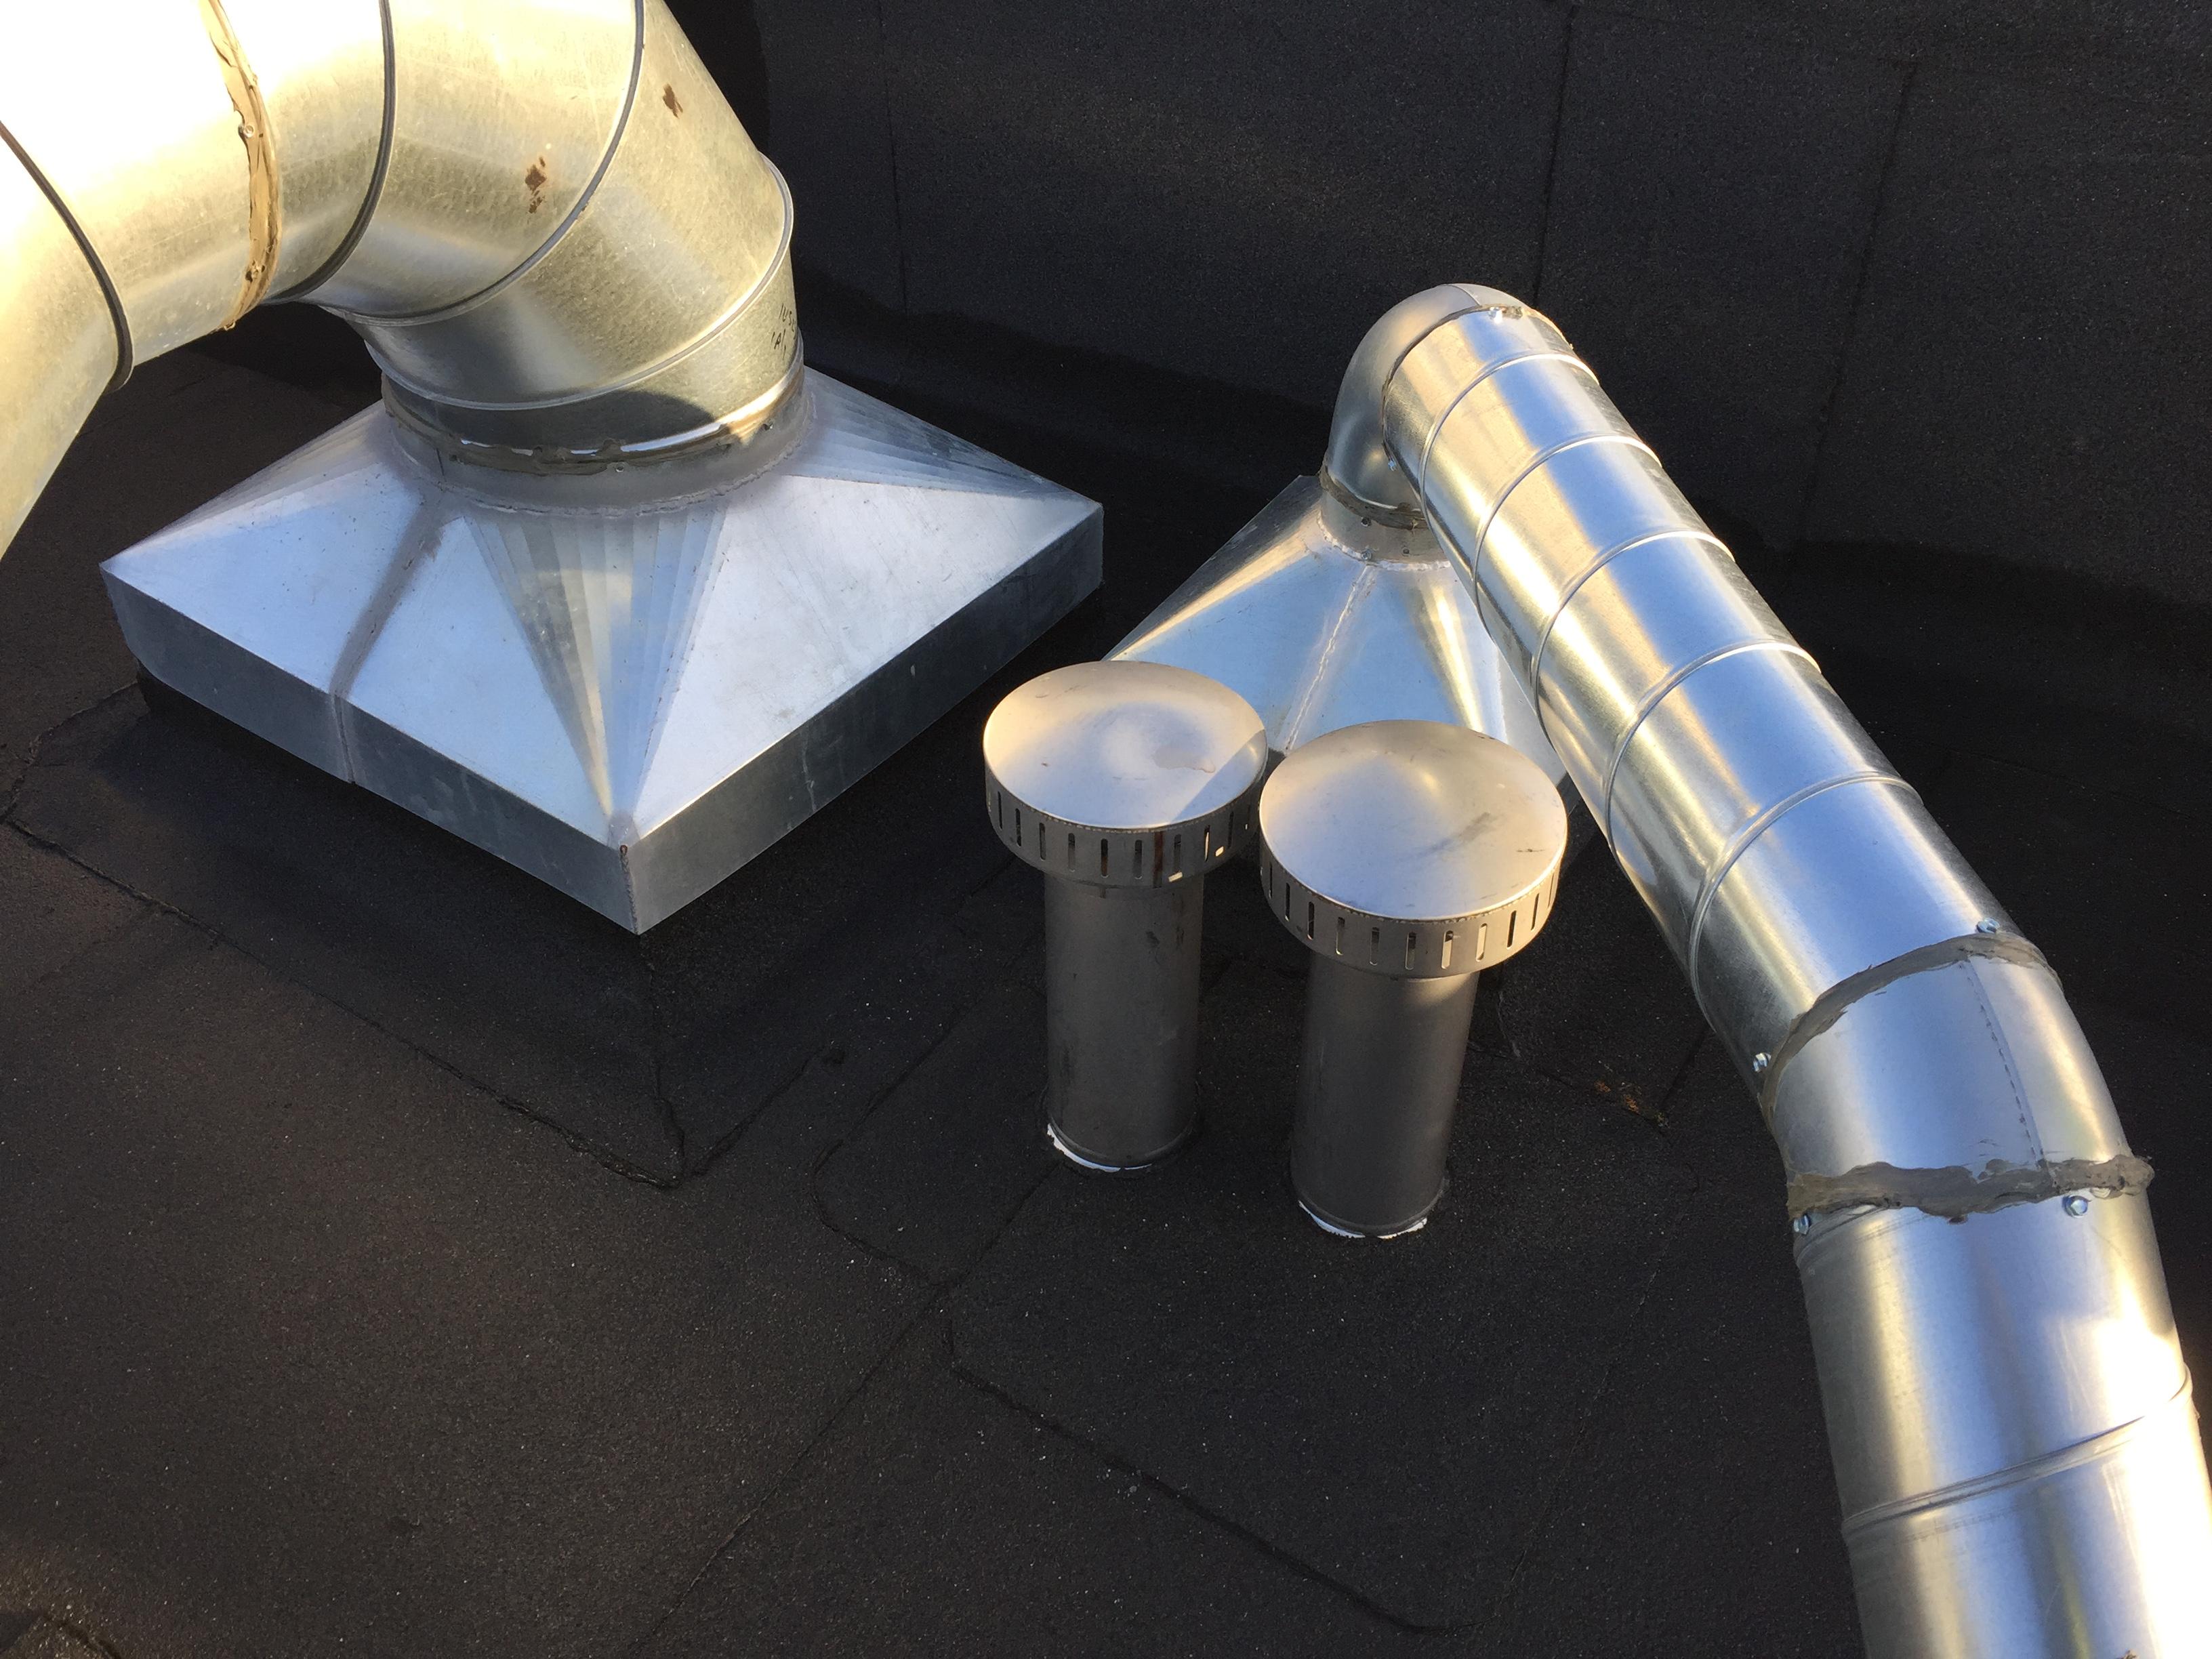 Commercial - IKO Bitumen - Donnybrook fair - Monami (3)